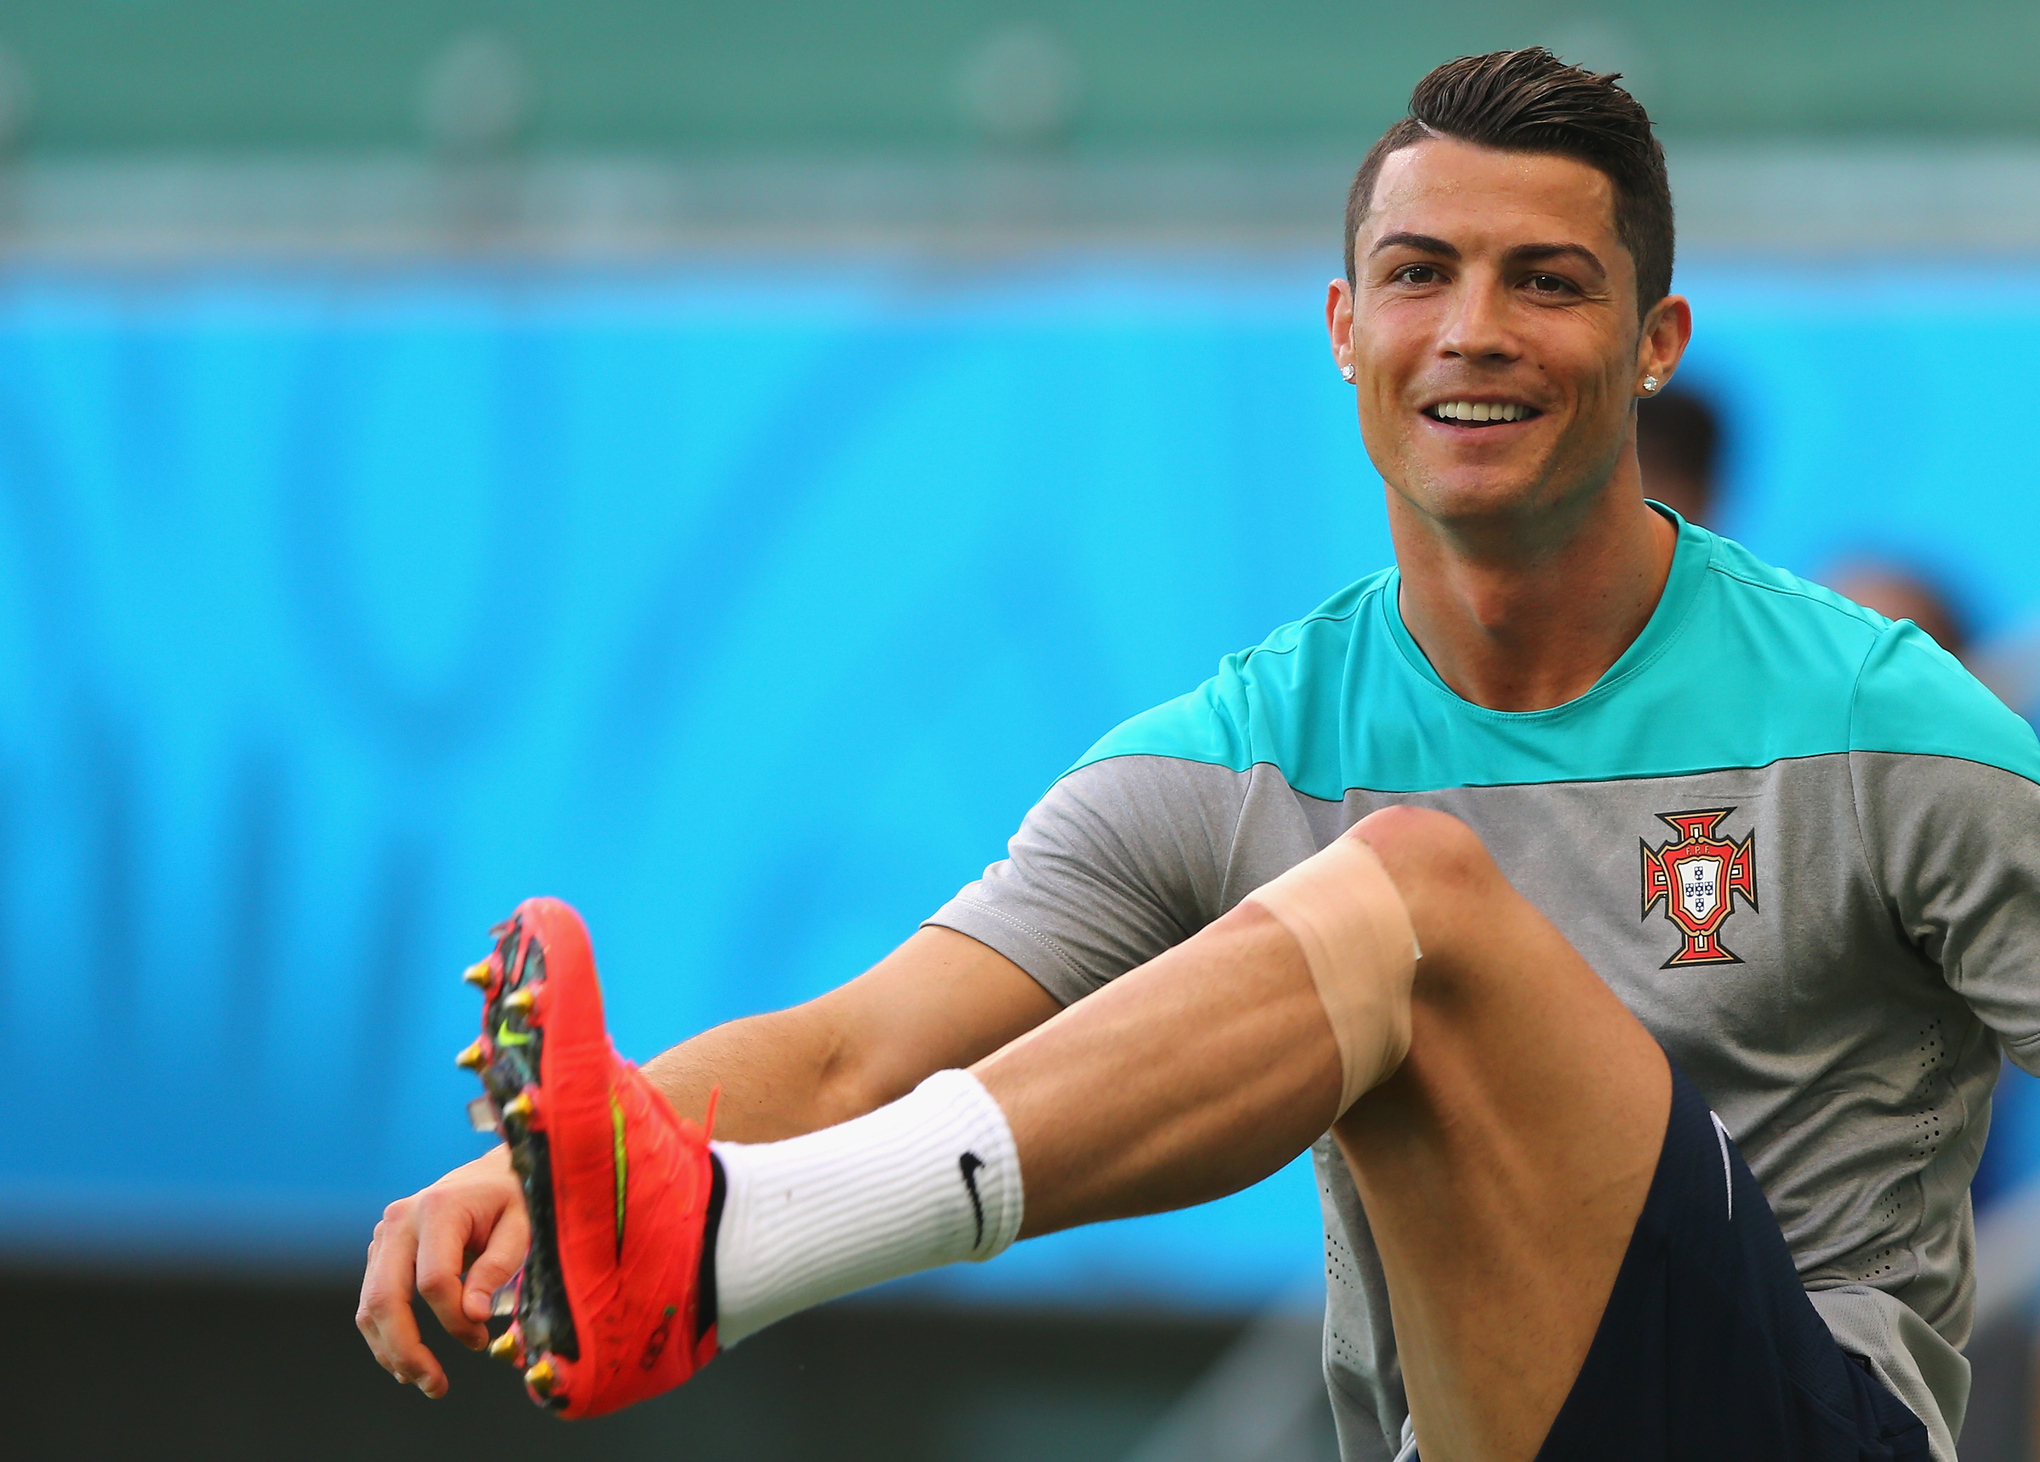 「Ronaldo nike」的圖片搜尋結果